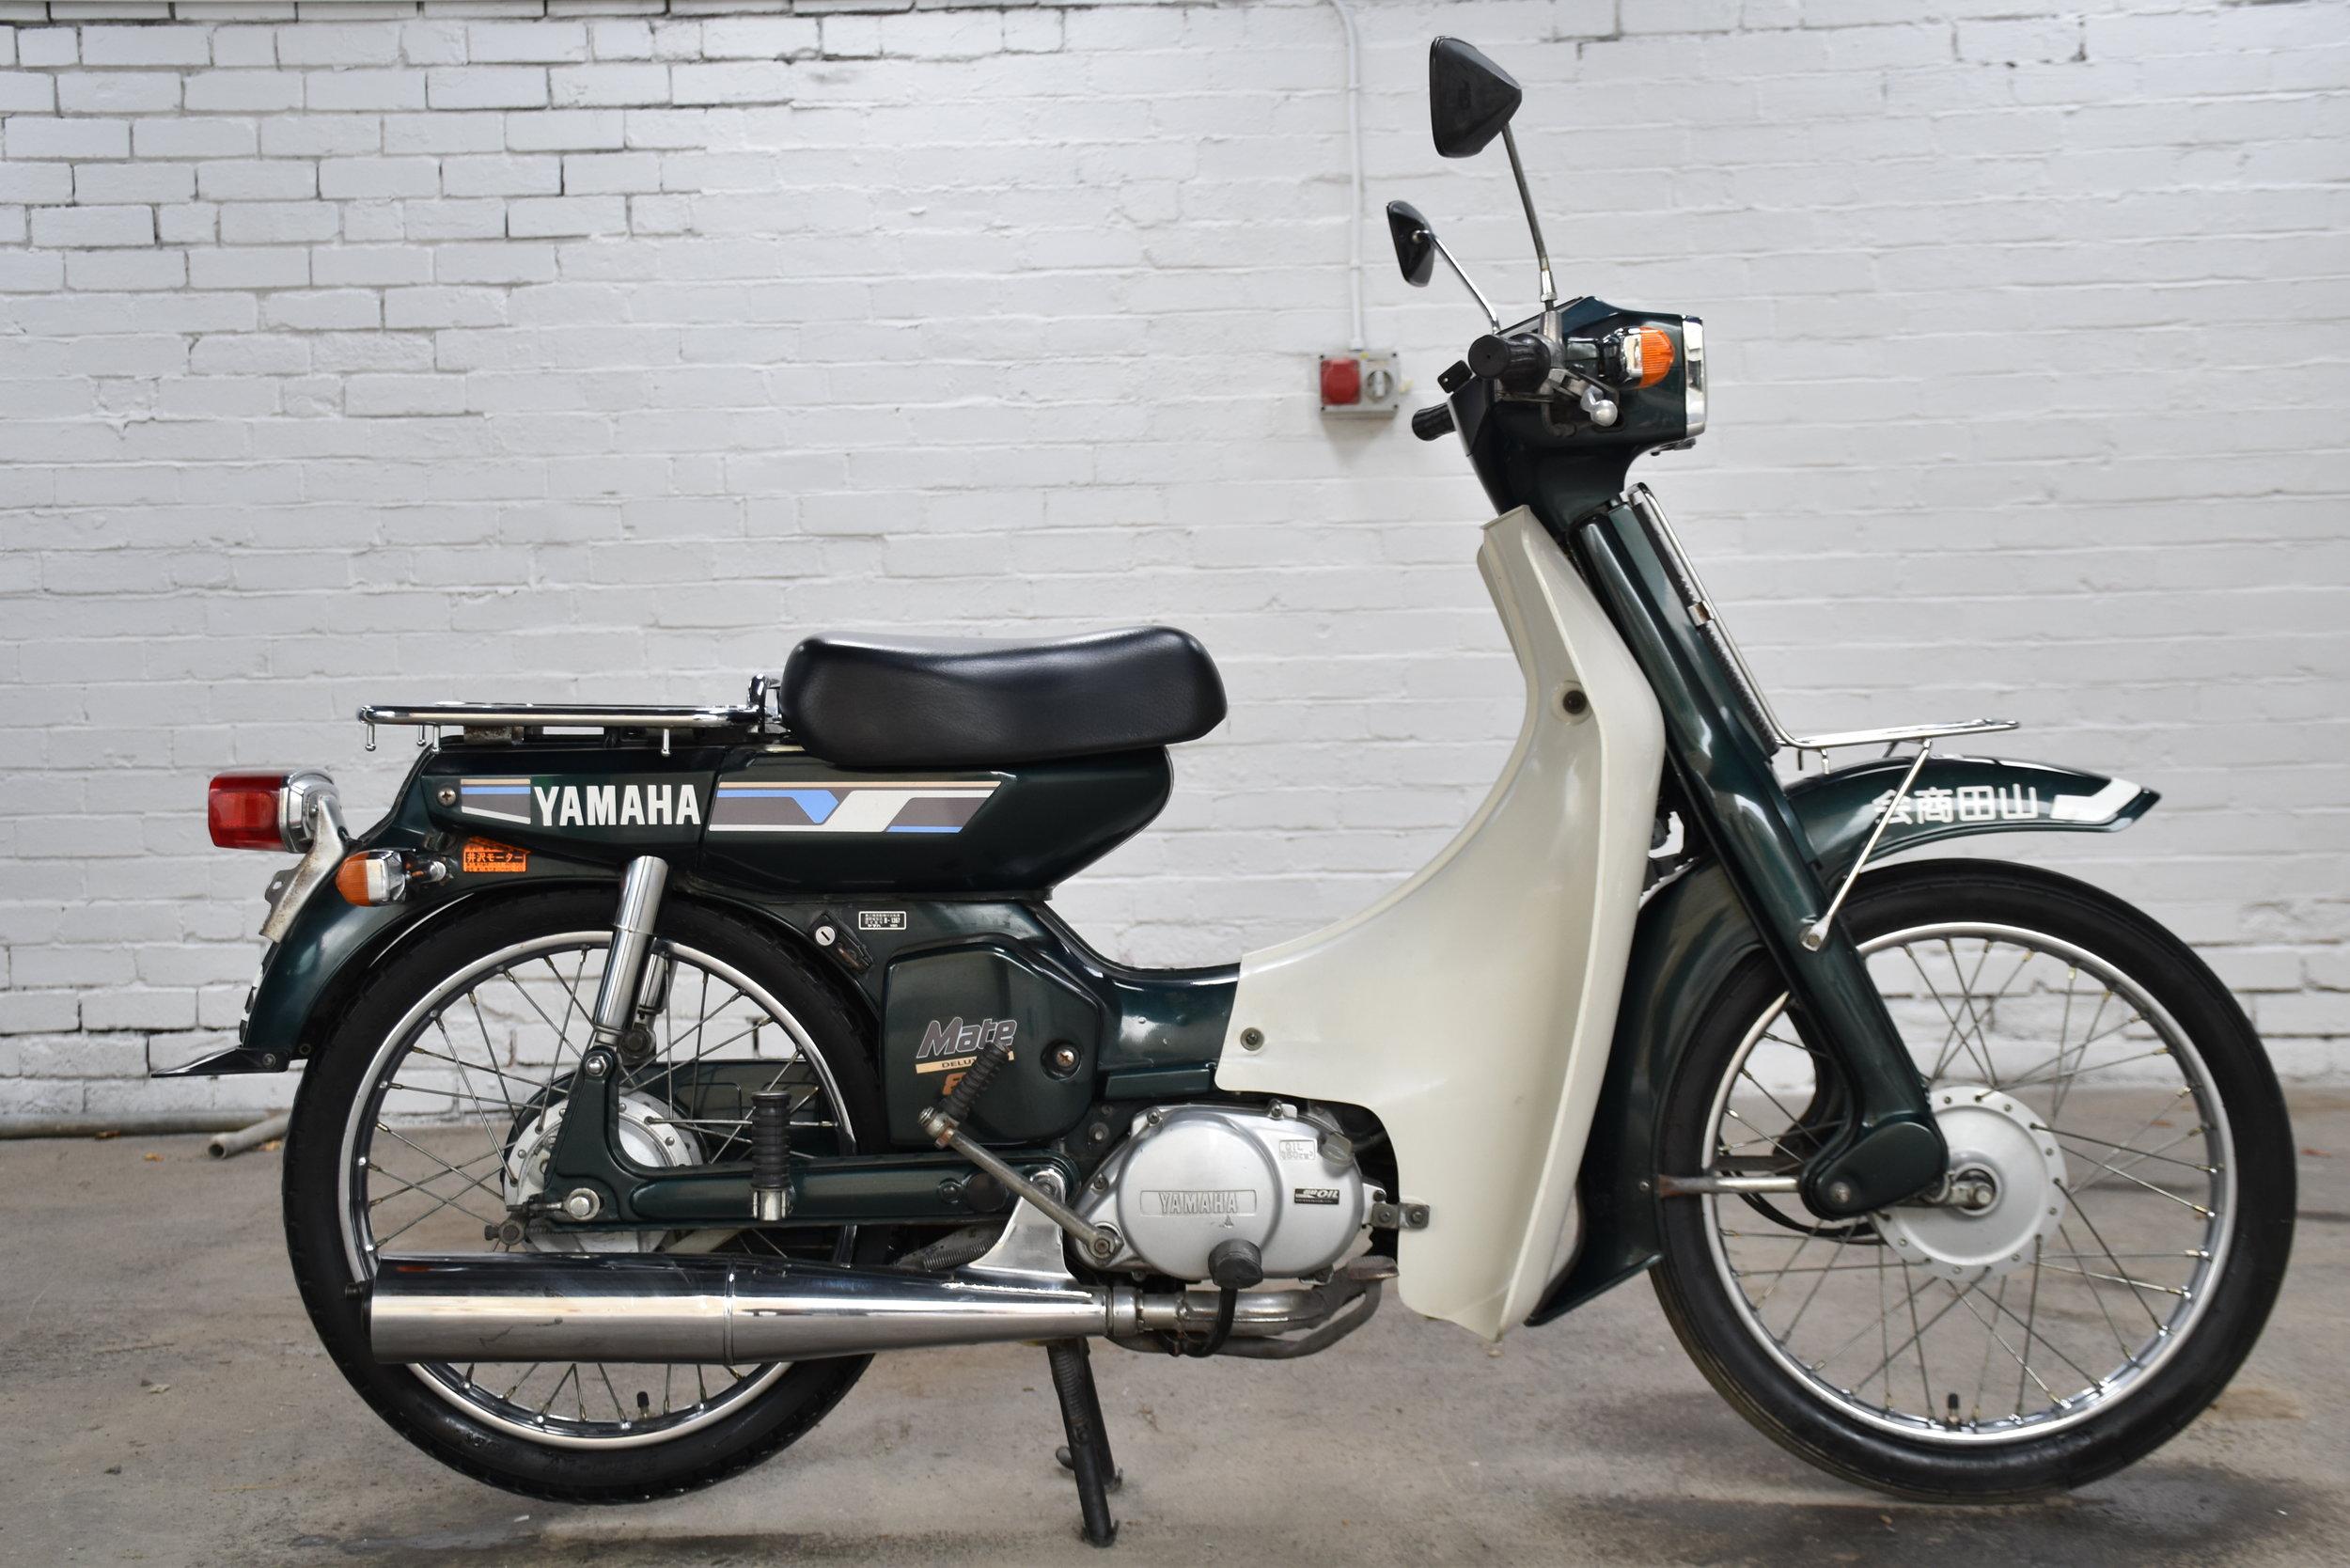 1991 Yamaha 80 V80 Final Edition Ref: 7795 £1650